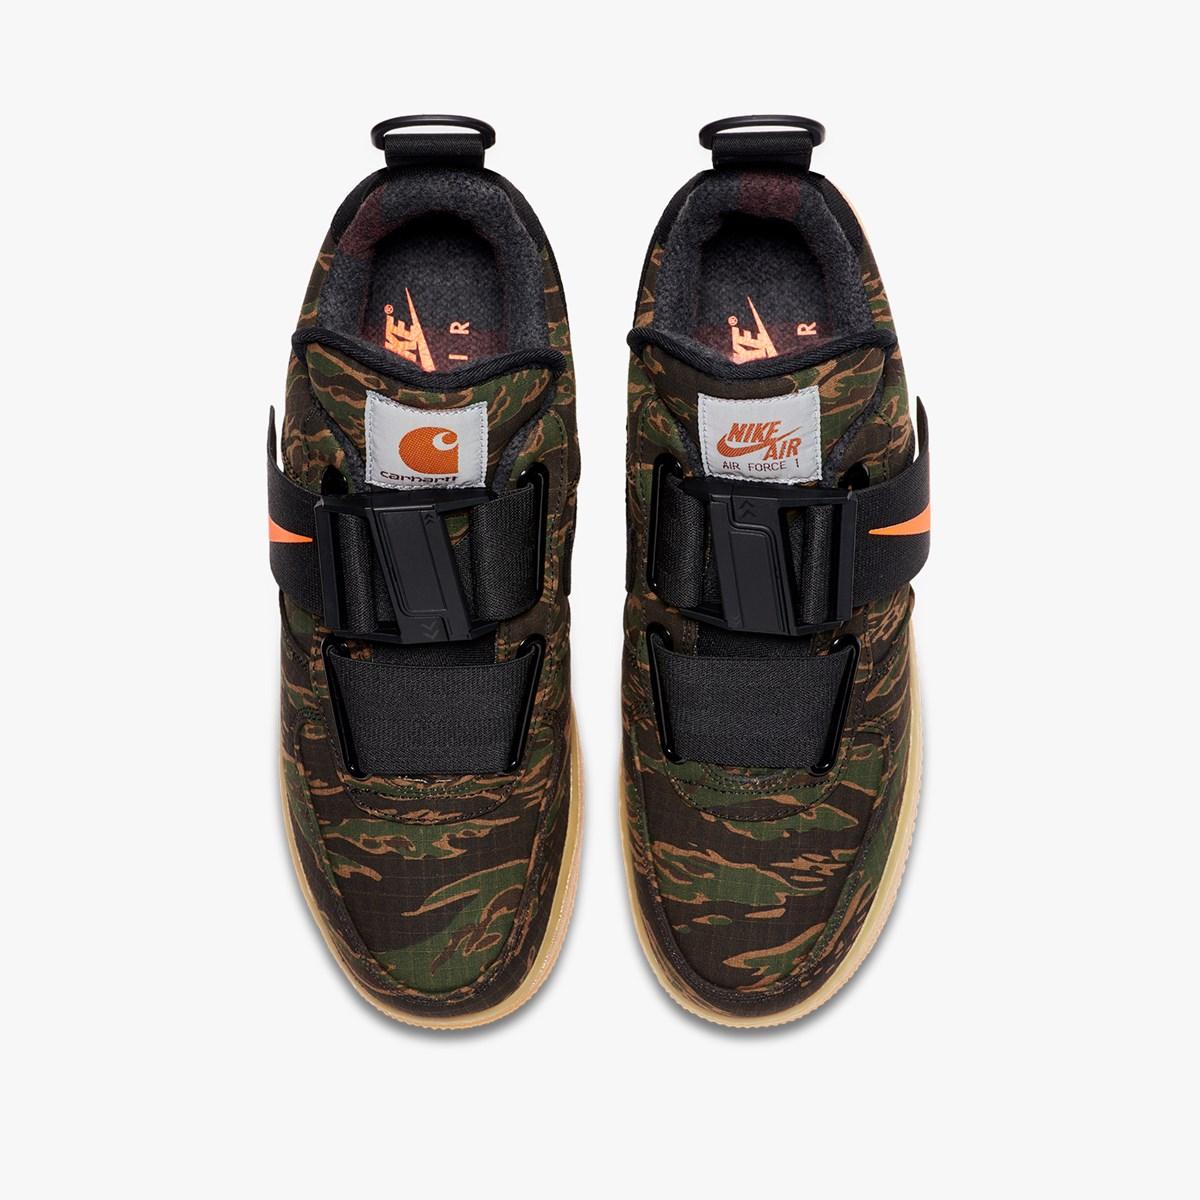 Nike Air Force 1 Utility Low Premium x